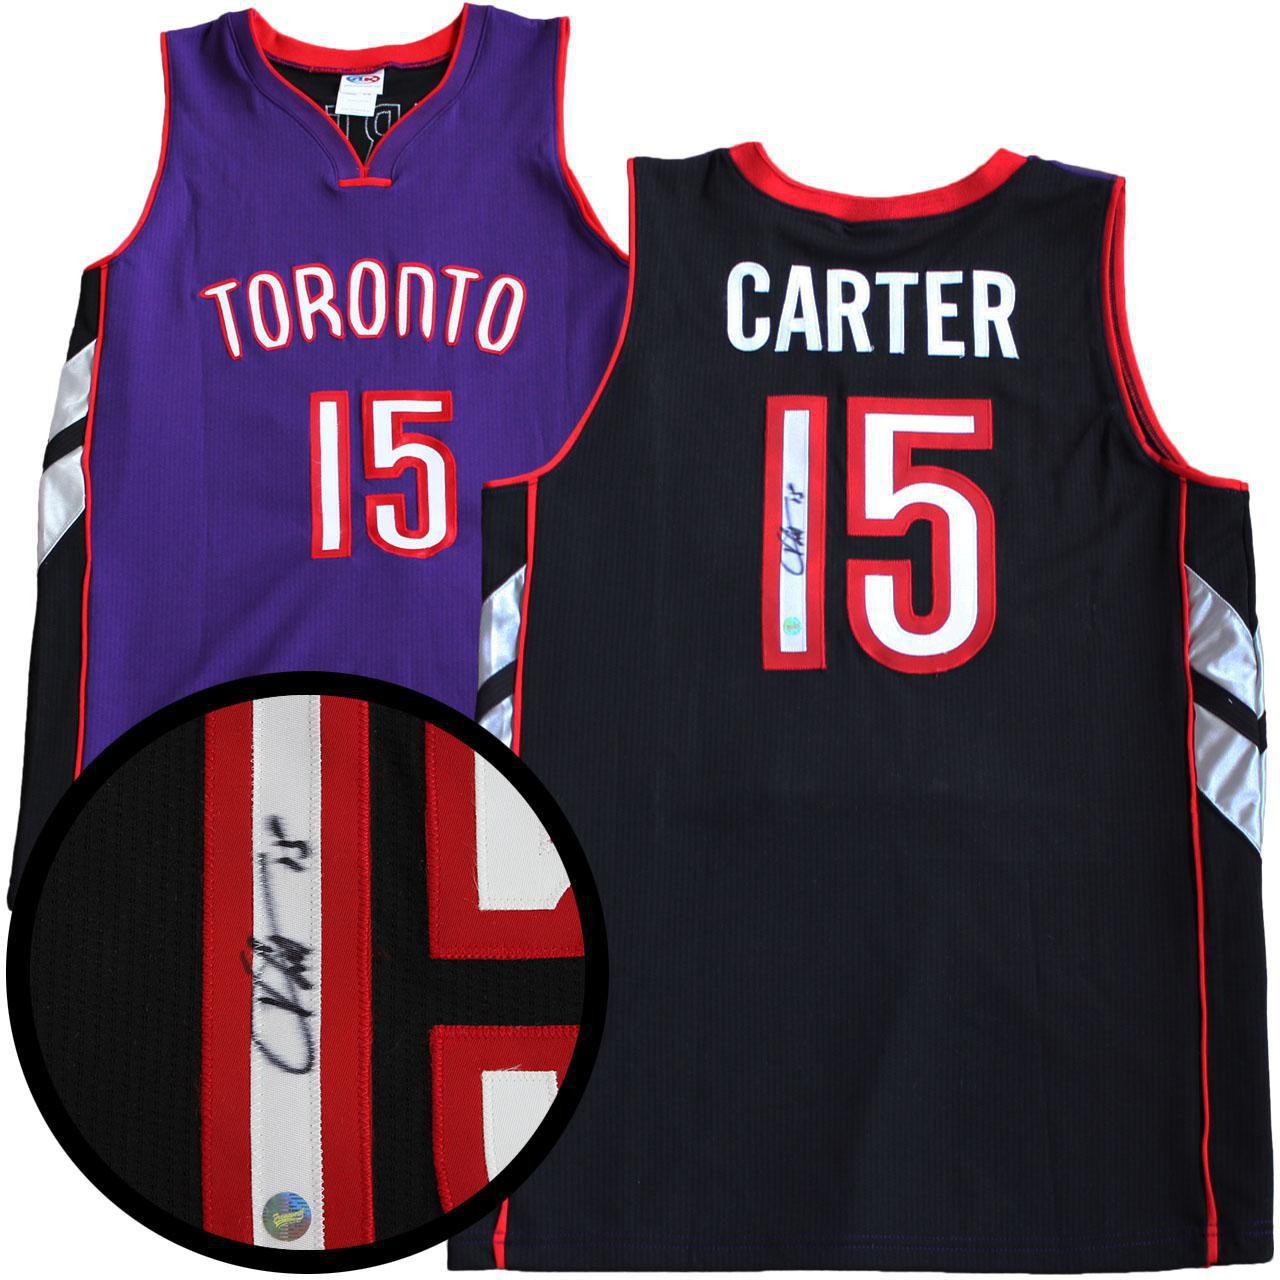 huge selection of 9a540 09d82 Vince Carter Signed Jersey Raptors Replica Purple